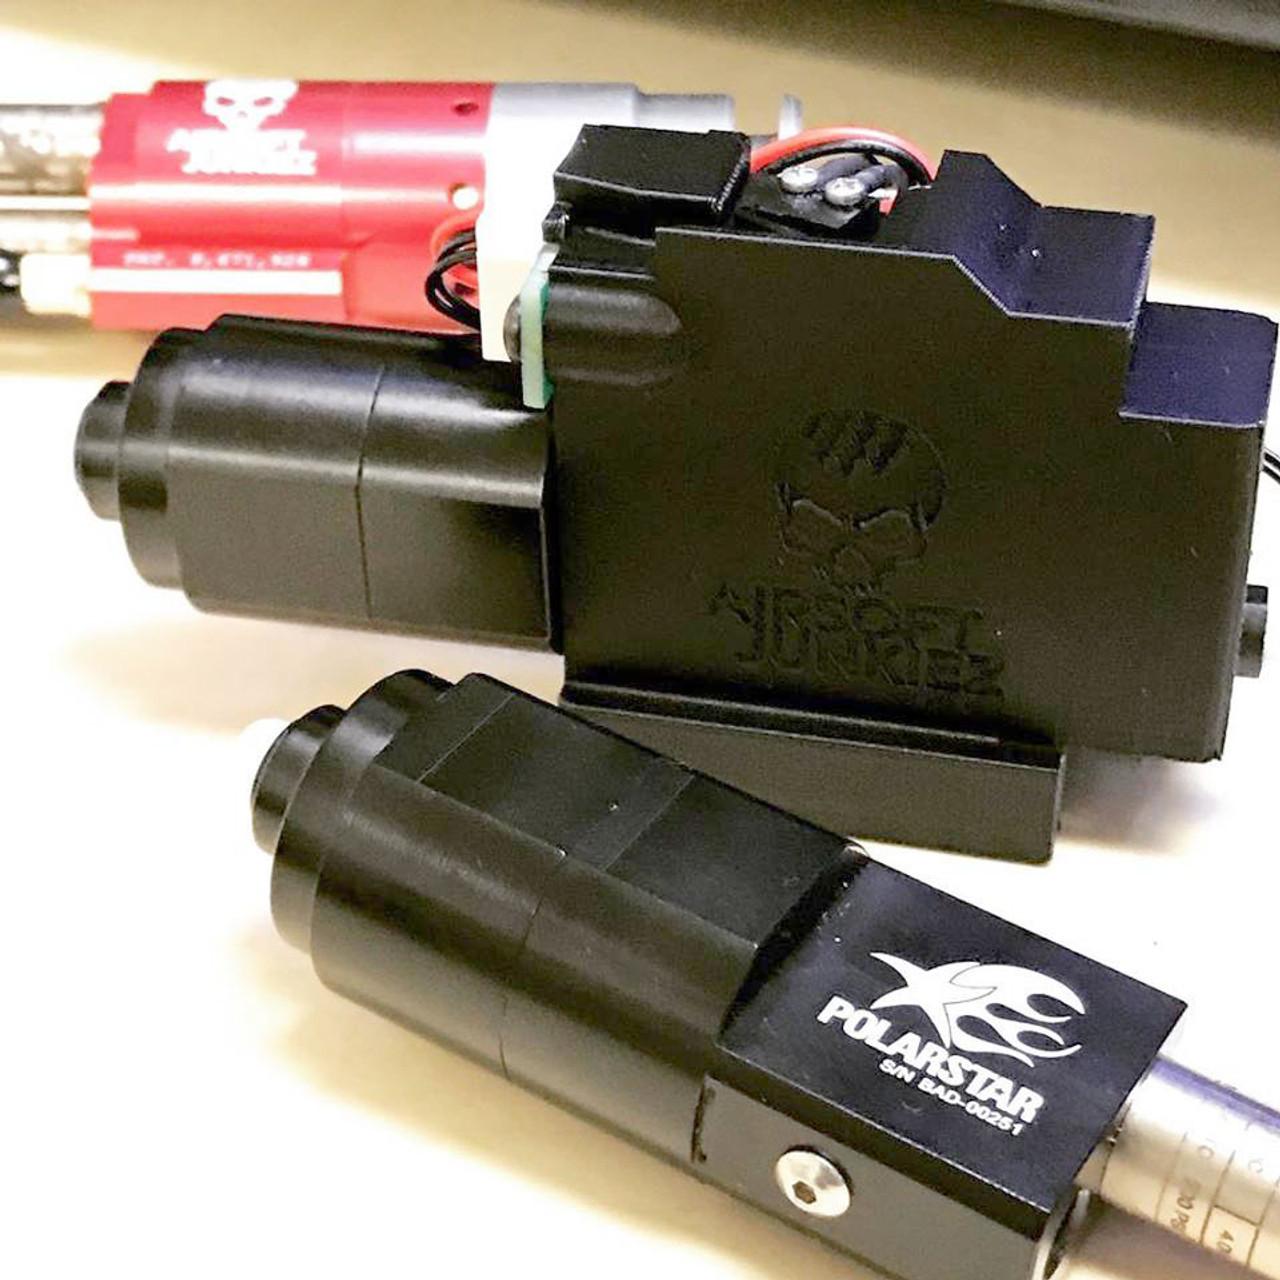 Bingo Airsoft Designs - PolarStar JACK TM MP7 Drop-in kit with IGL